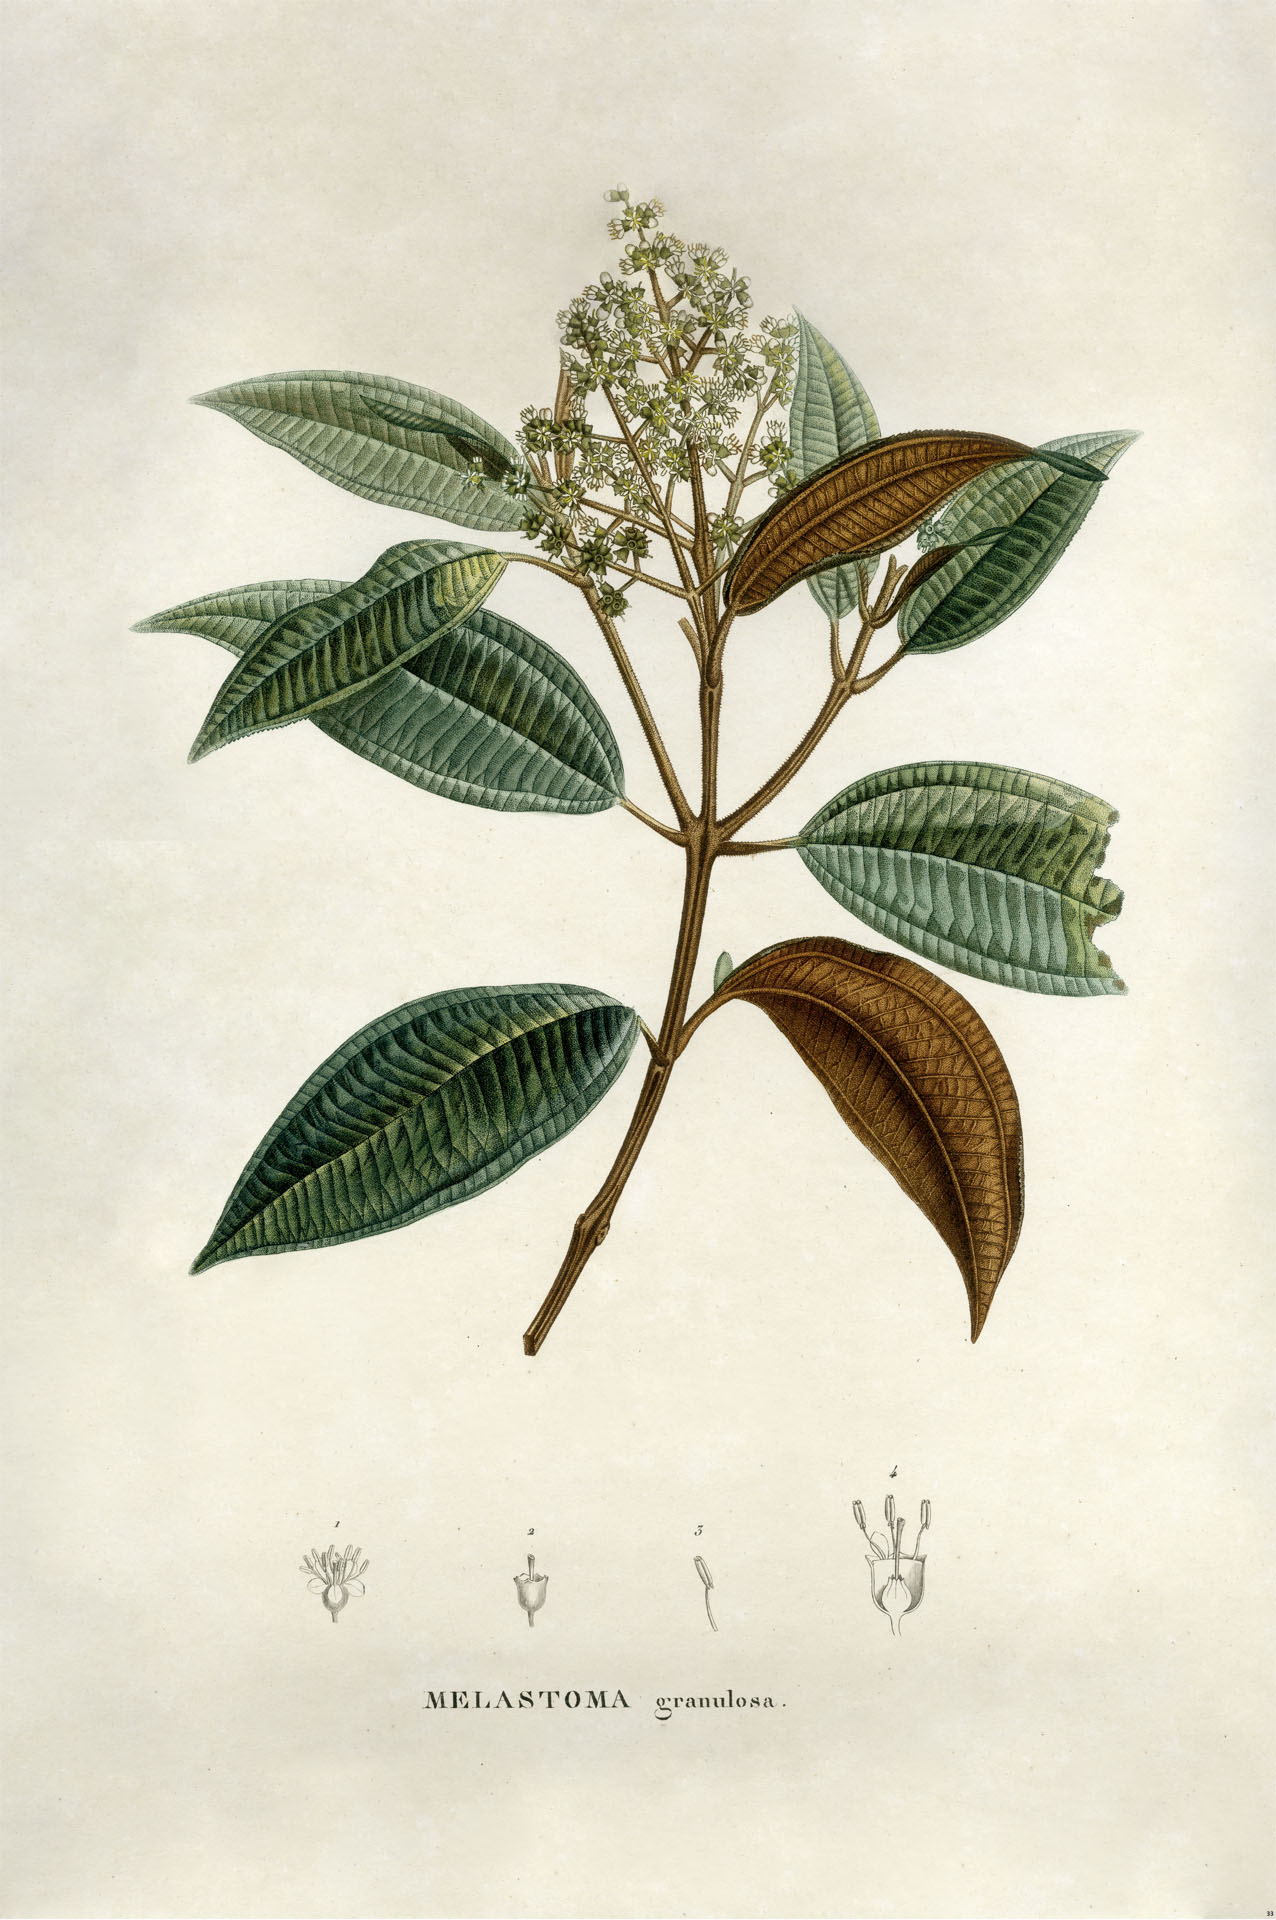 Melastoma Granulosa